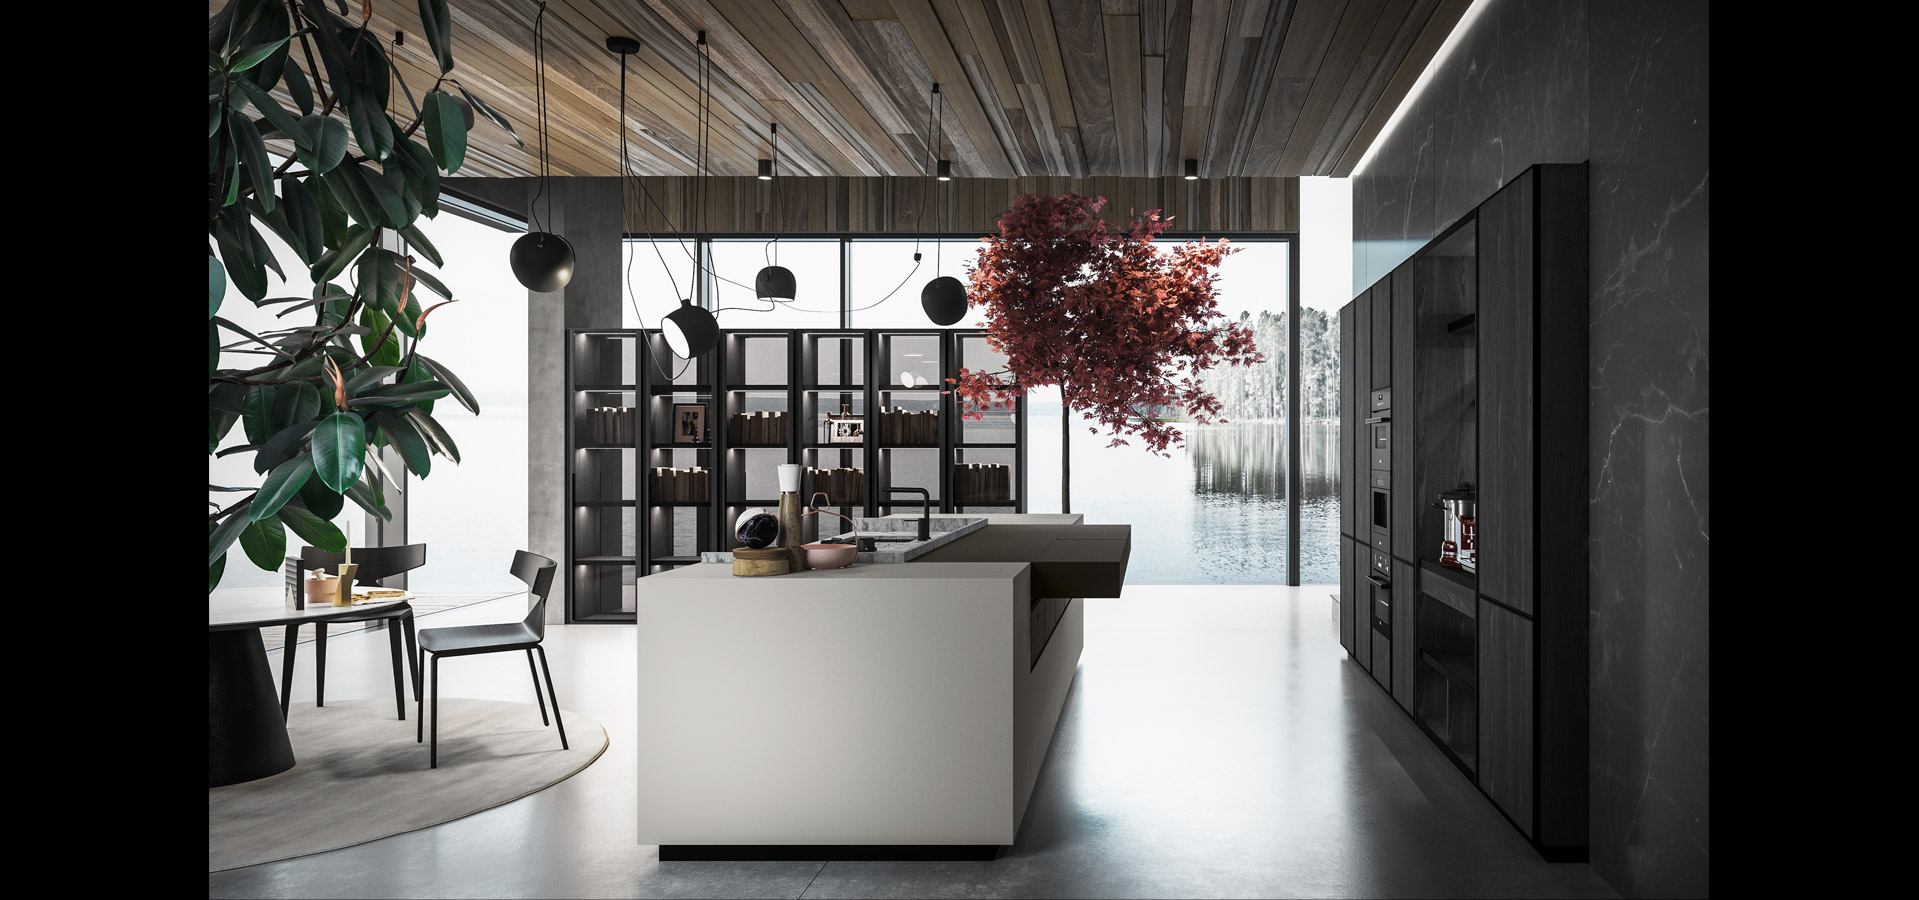 Cucina contemporanea rovere terranera | Amari | MITON Cucine